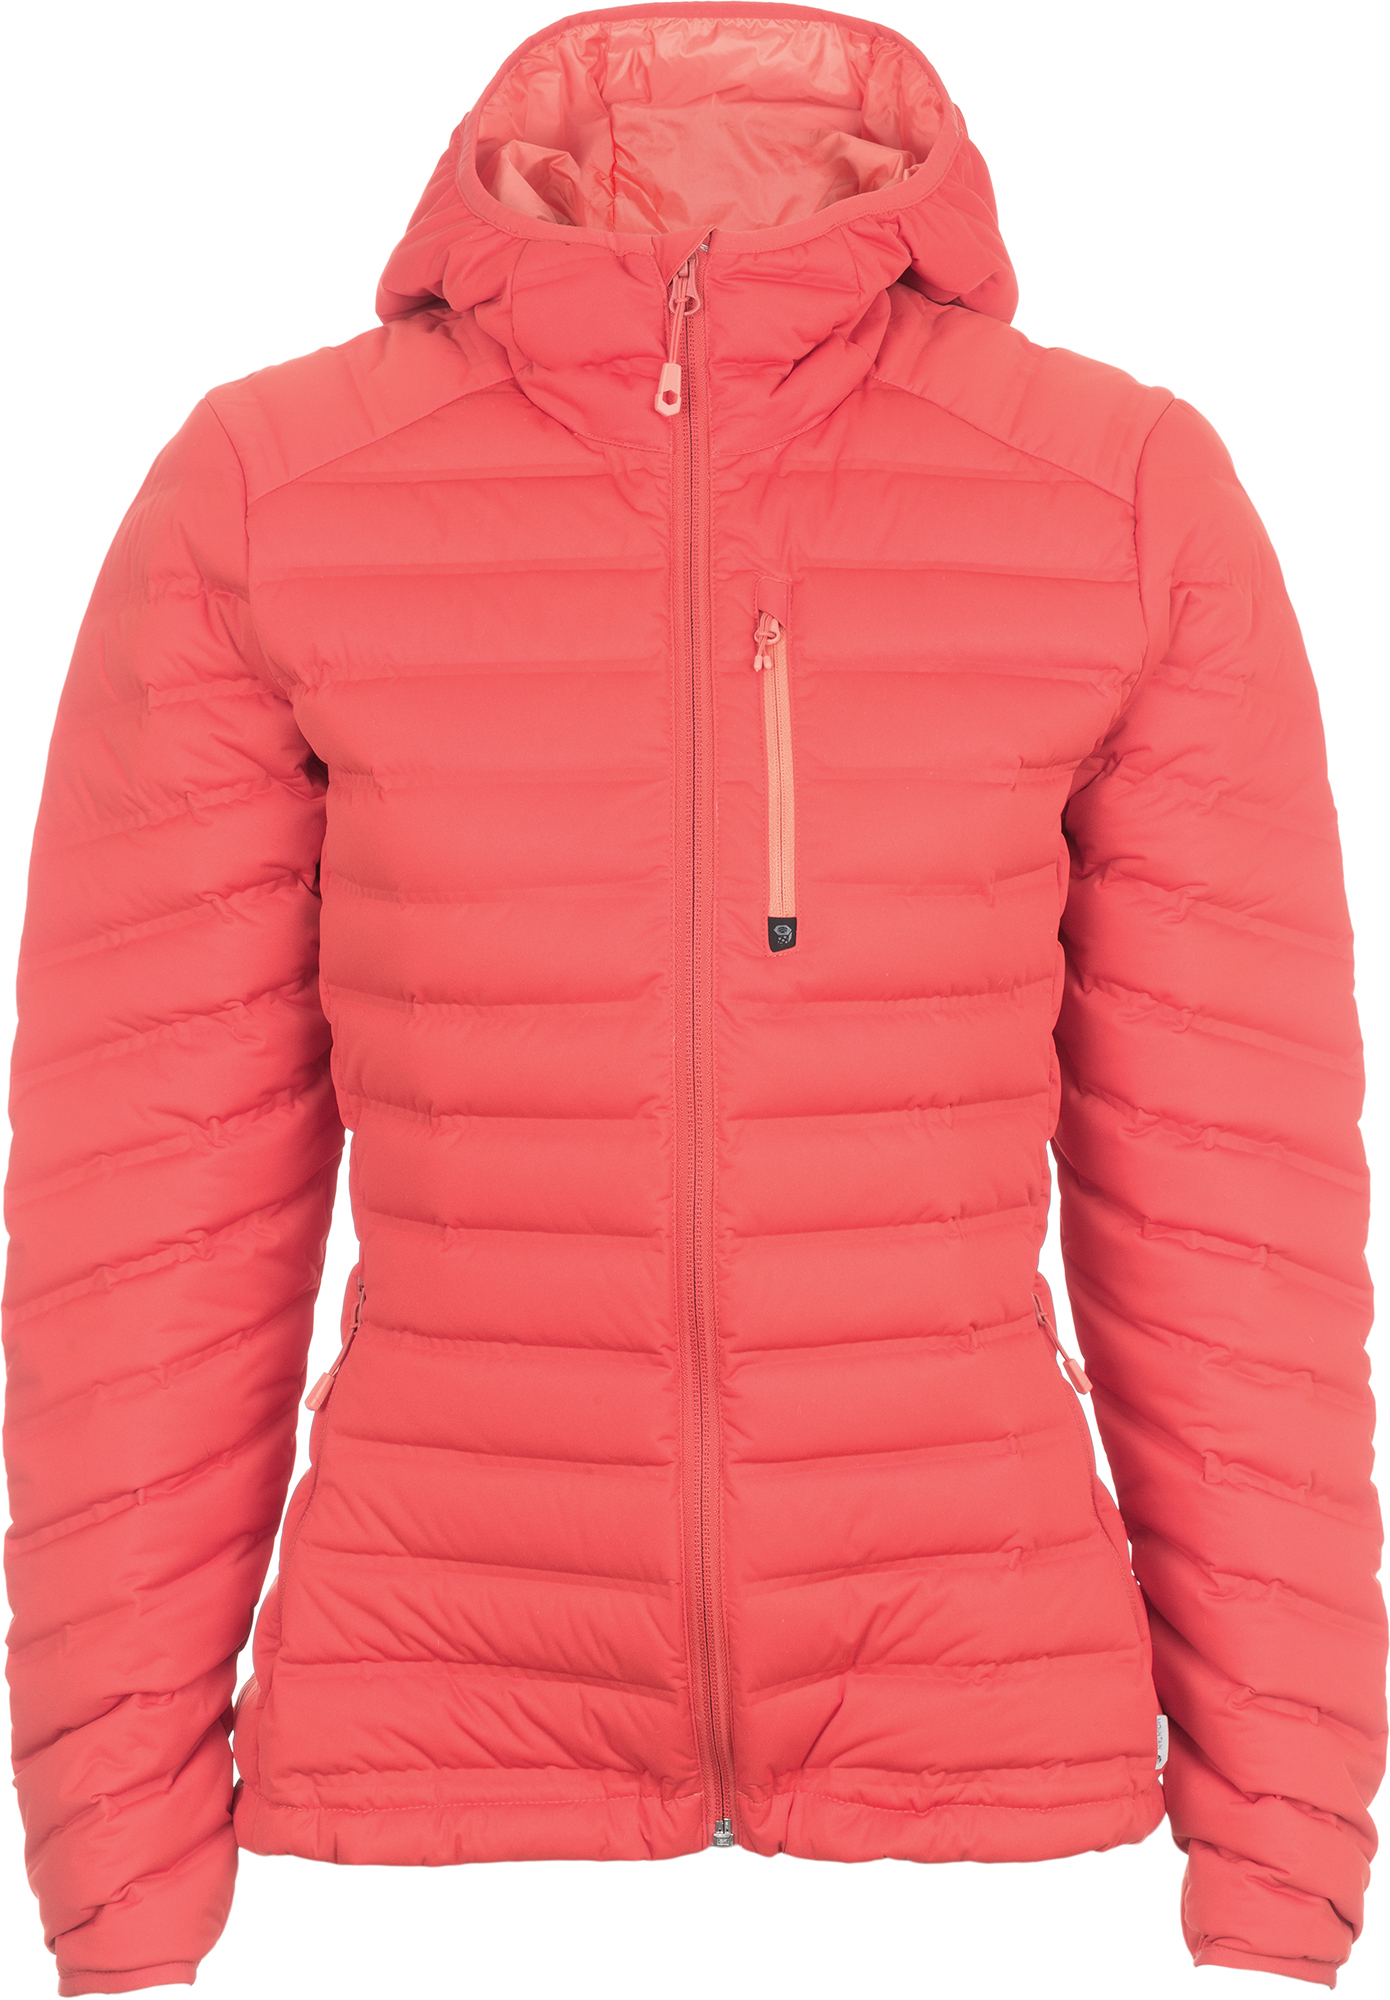 Mountain Hardwear Куртка пуховая женская Mountain Hardwear StretchDown, размер 48